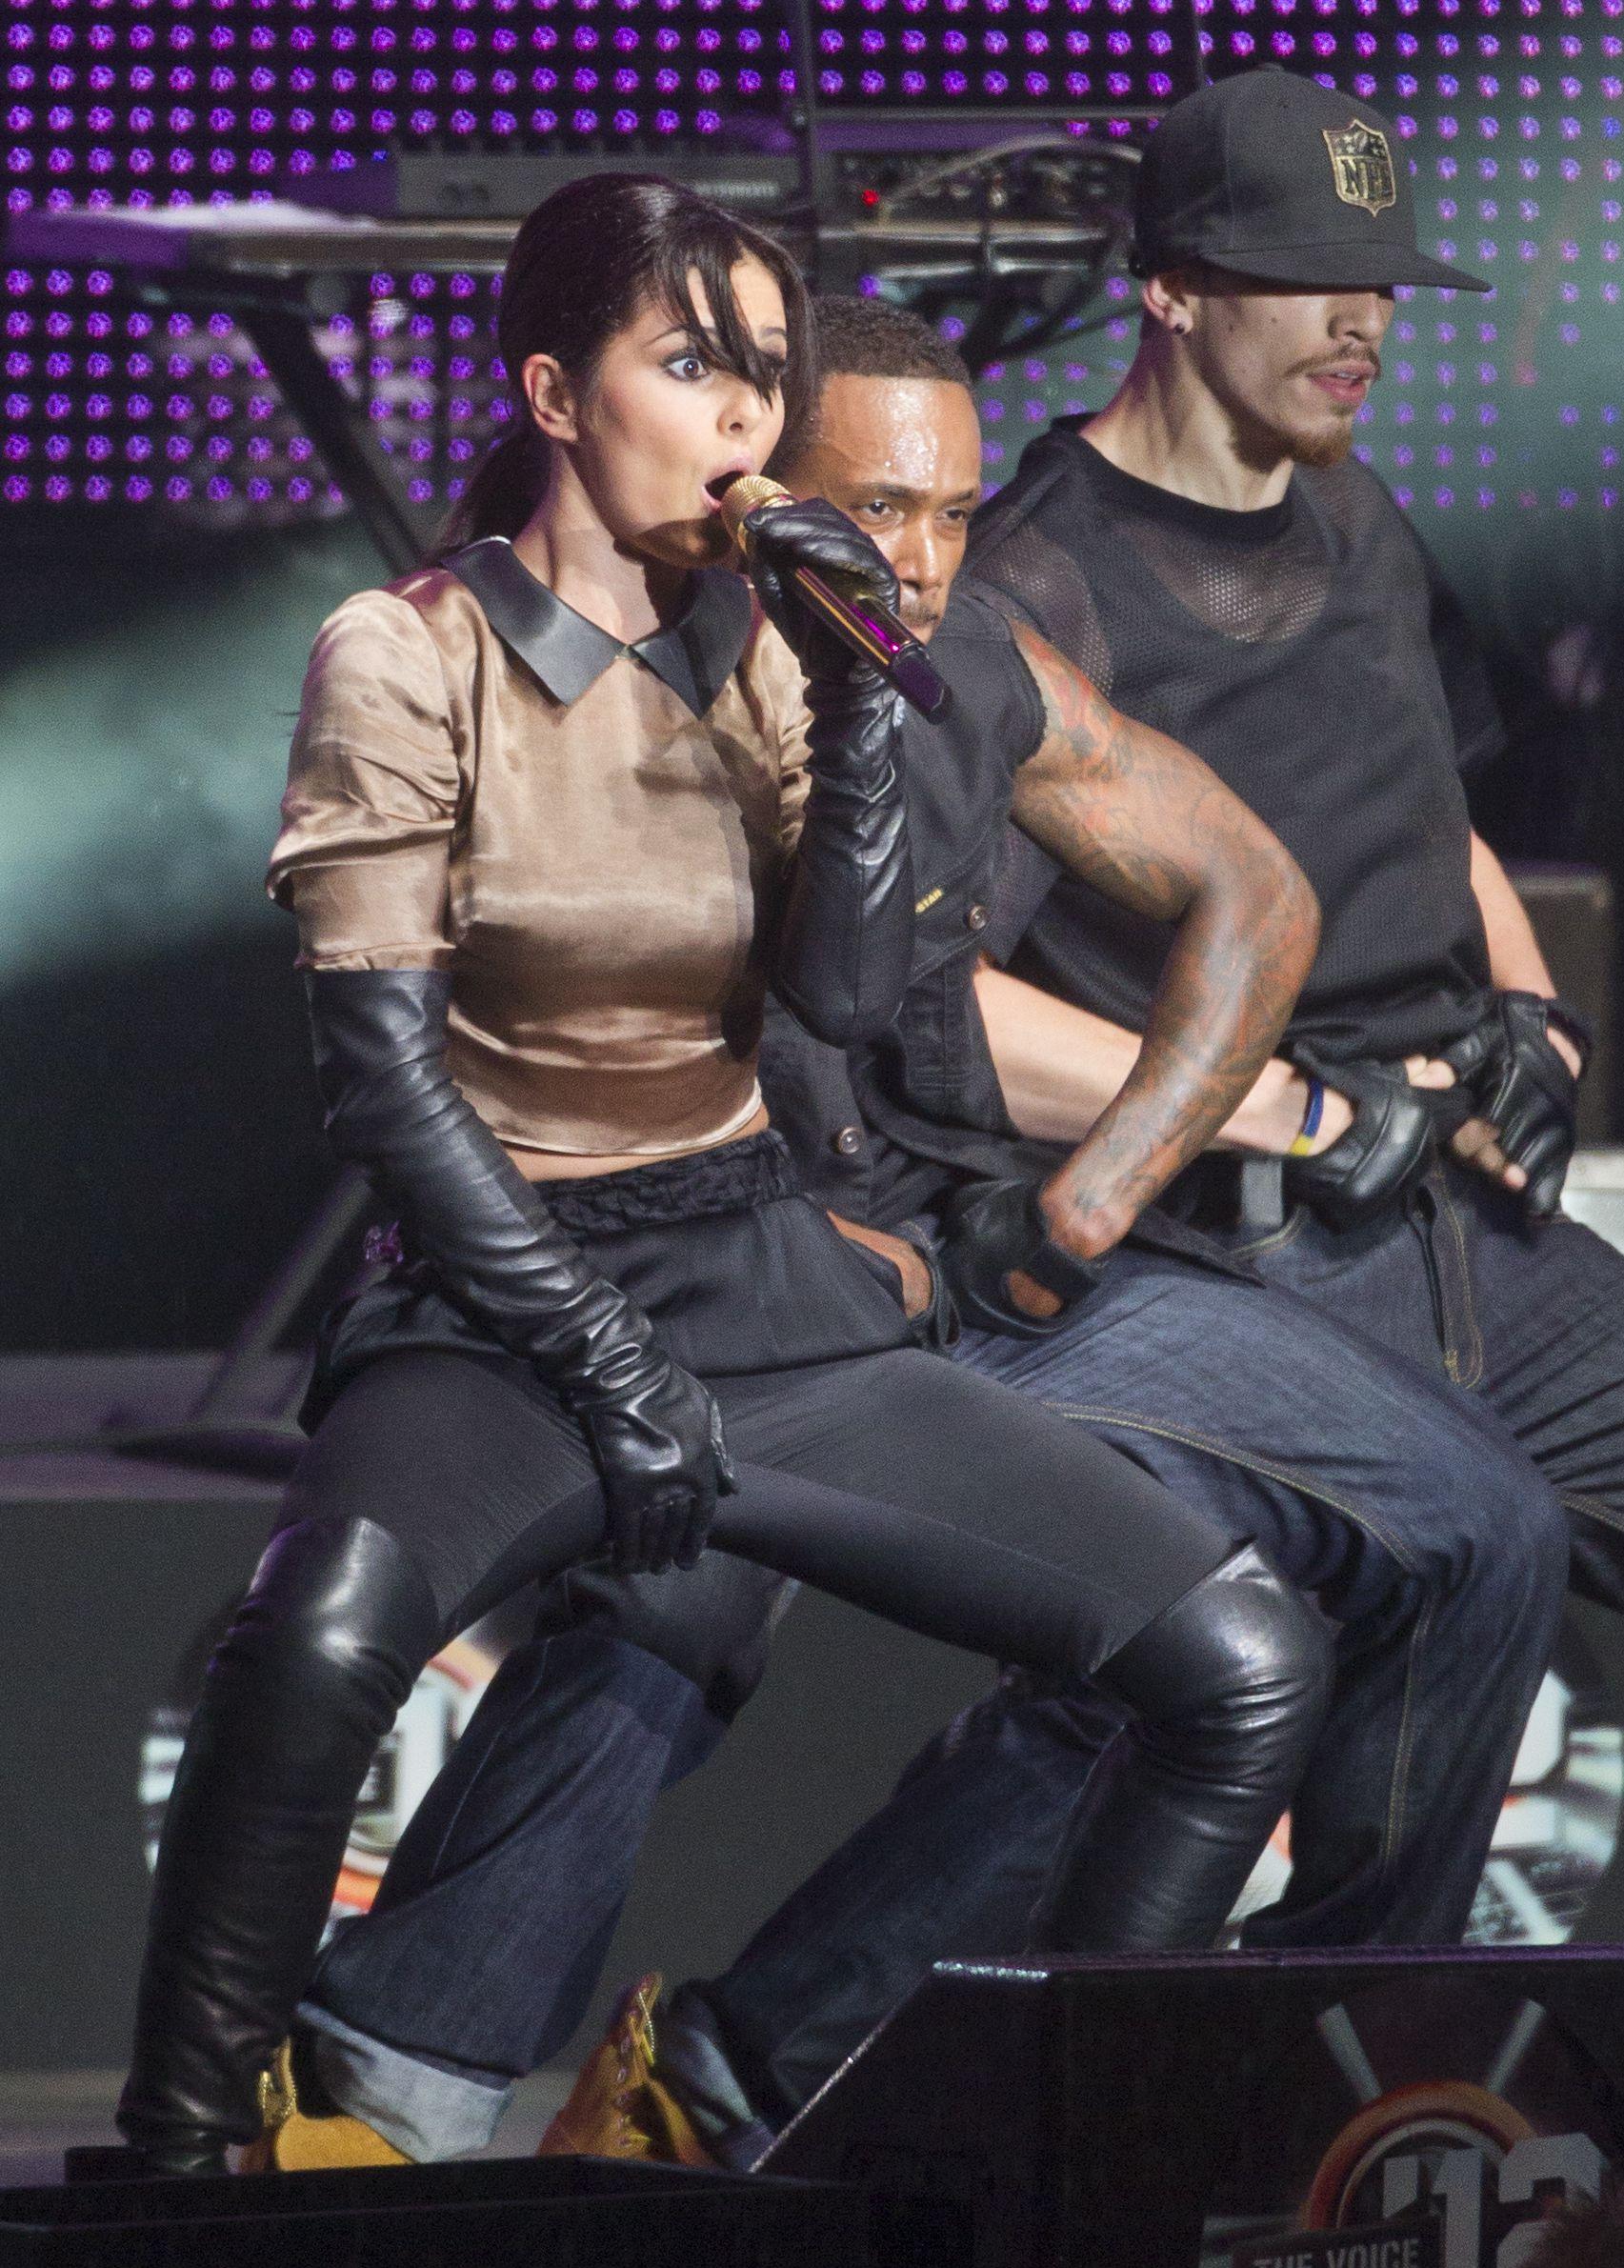 Cheryl Cole - The Voice_0001.jpg